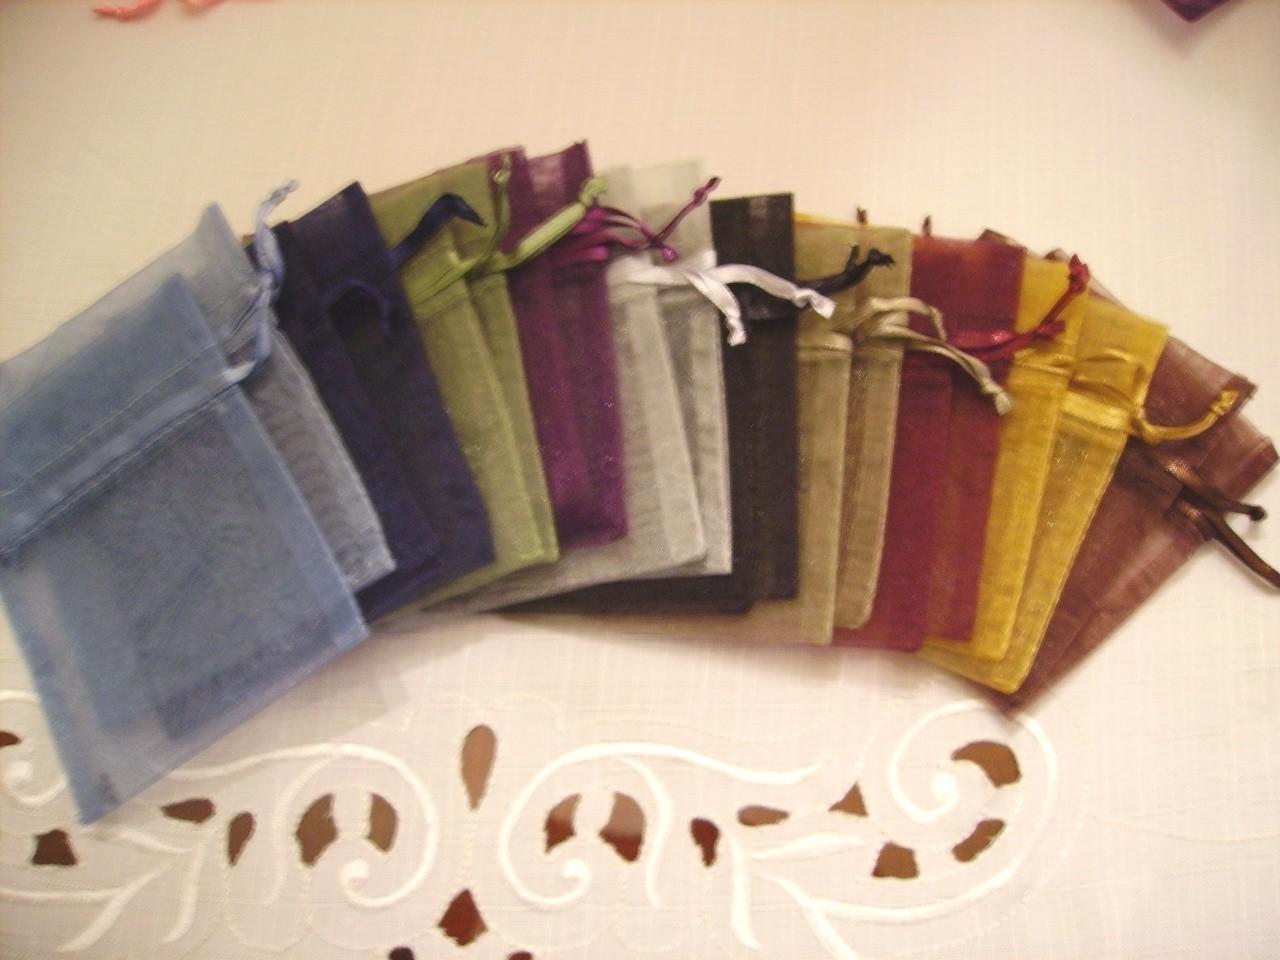 100 - 4 x 6 Organza Bags - Dark Assortment - Great for wedding favors,